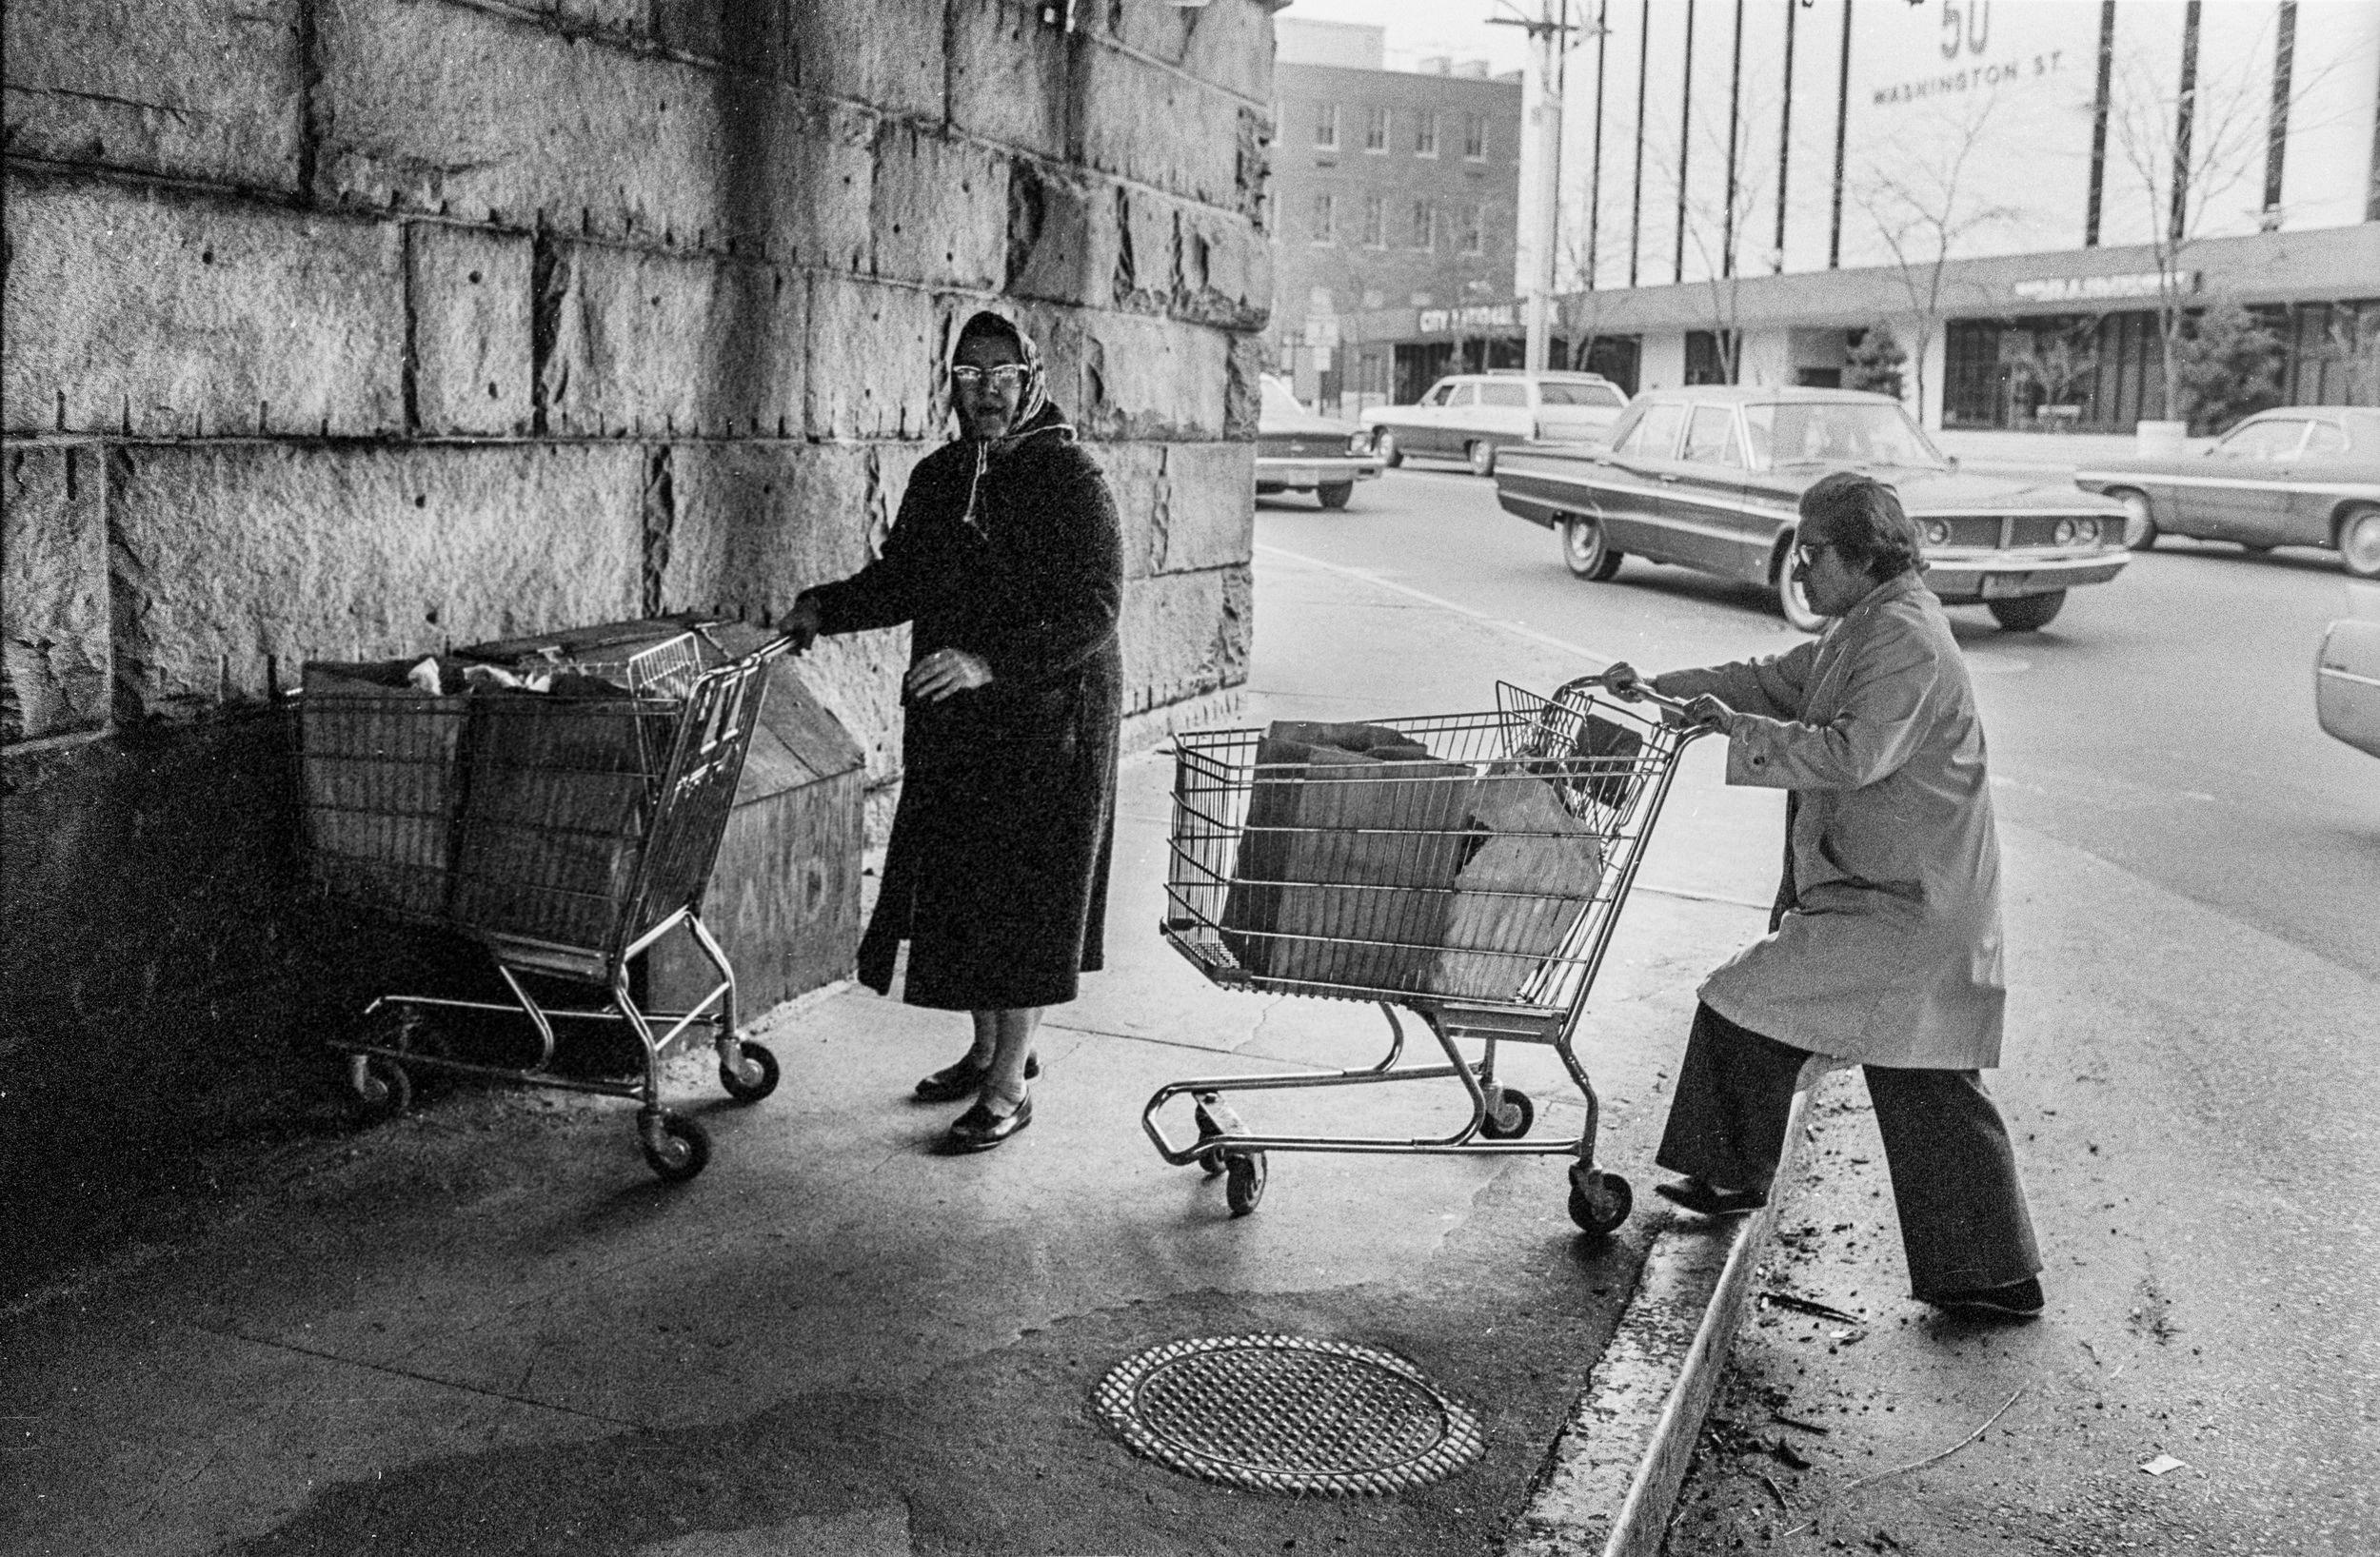 Norwalk, CT, 1976